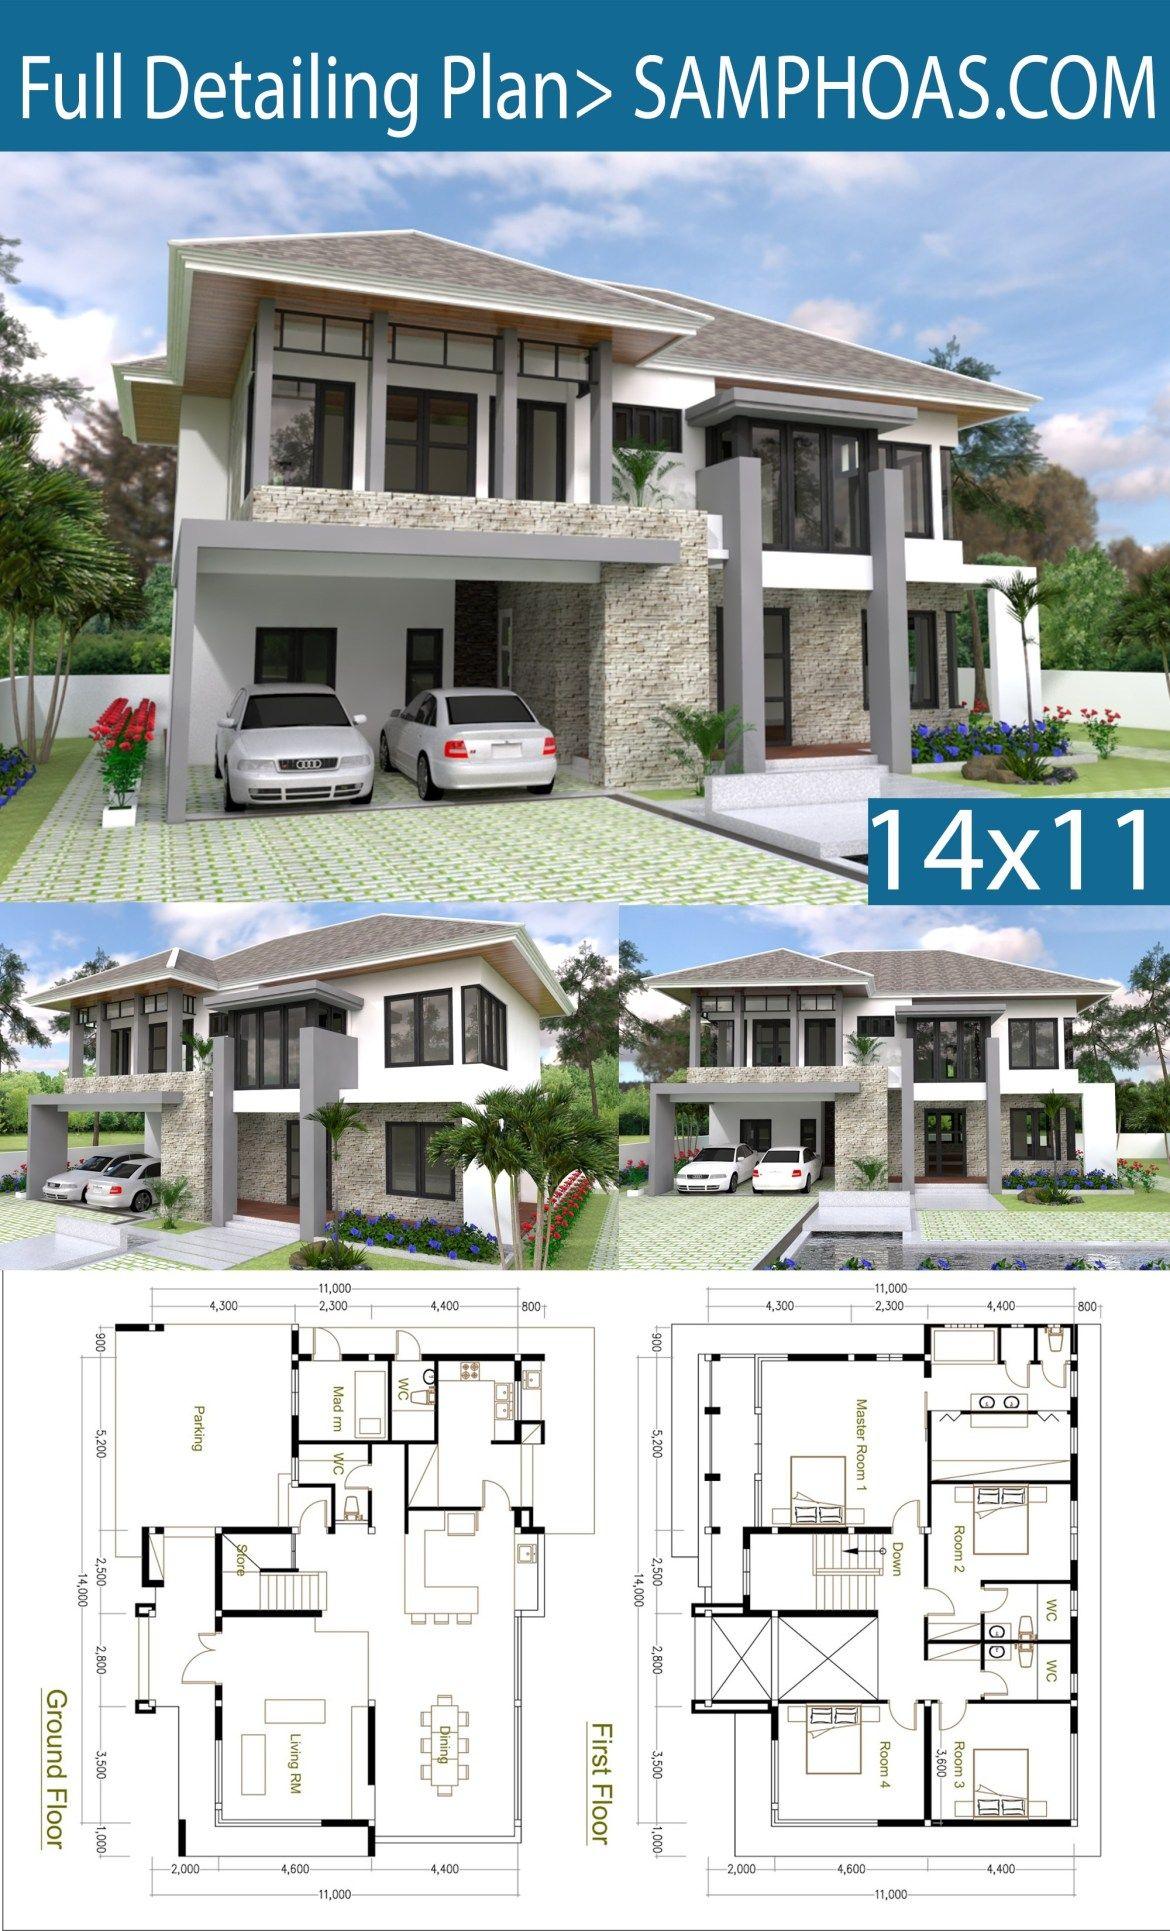 4 Bedrooms Home Design Plan Size 14x11m Samphoas Plansearch House Architecture Design Modern House Plans House Layout Plans